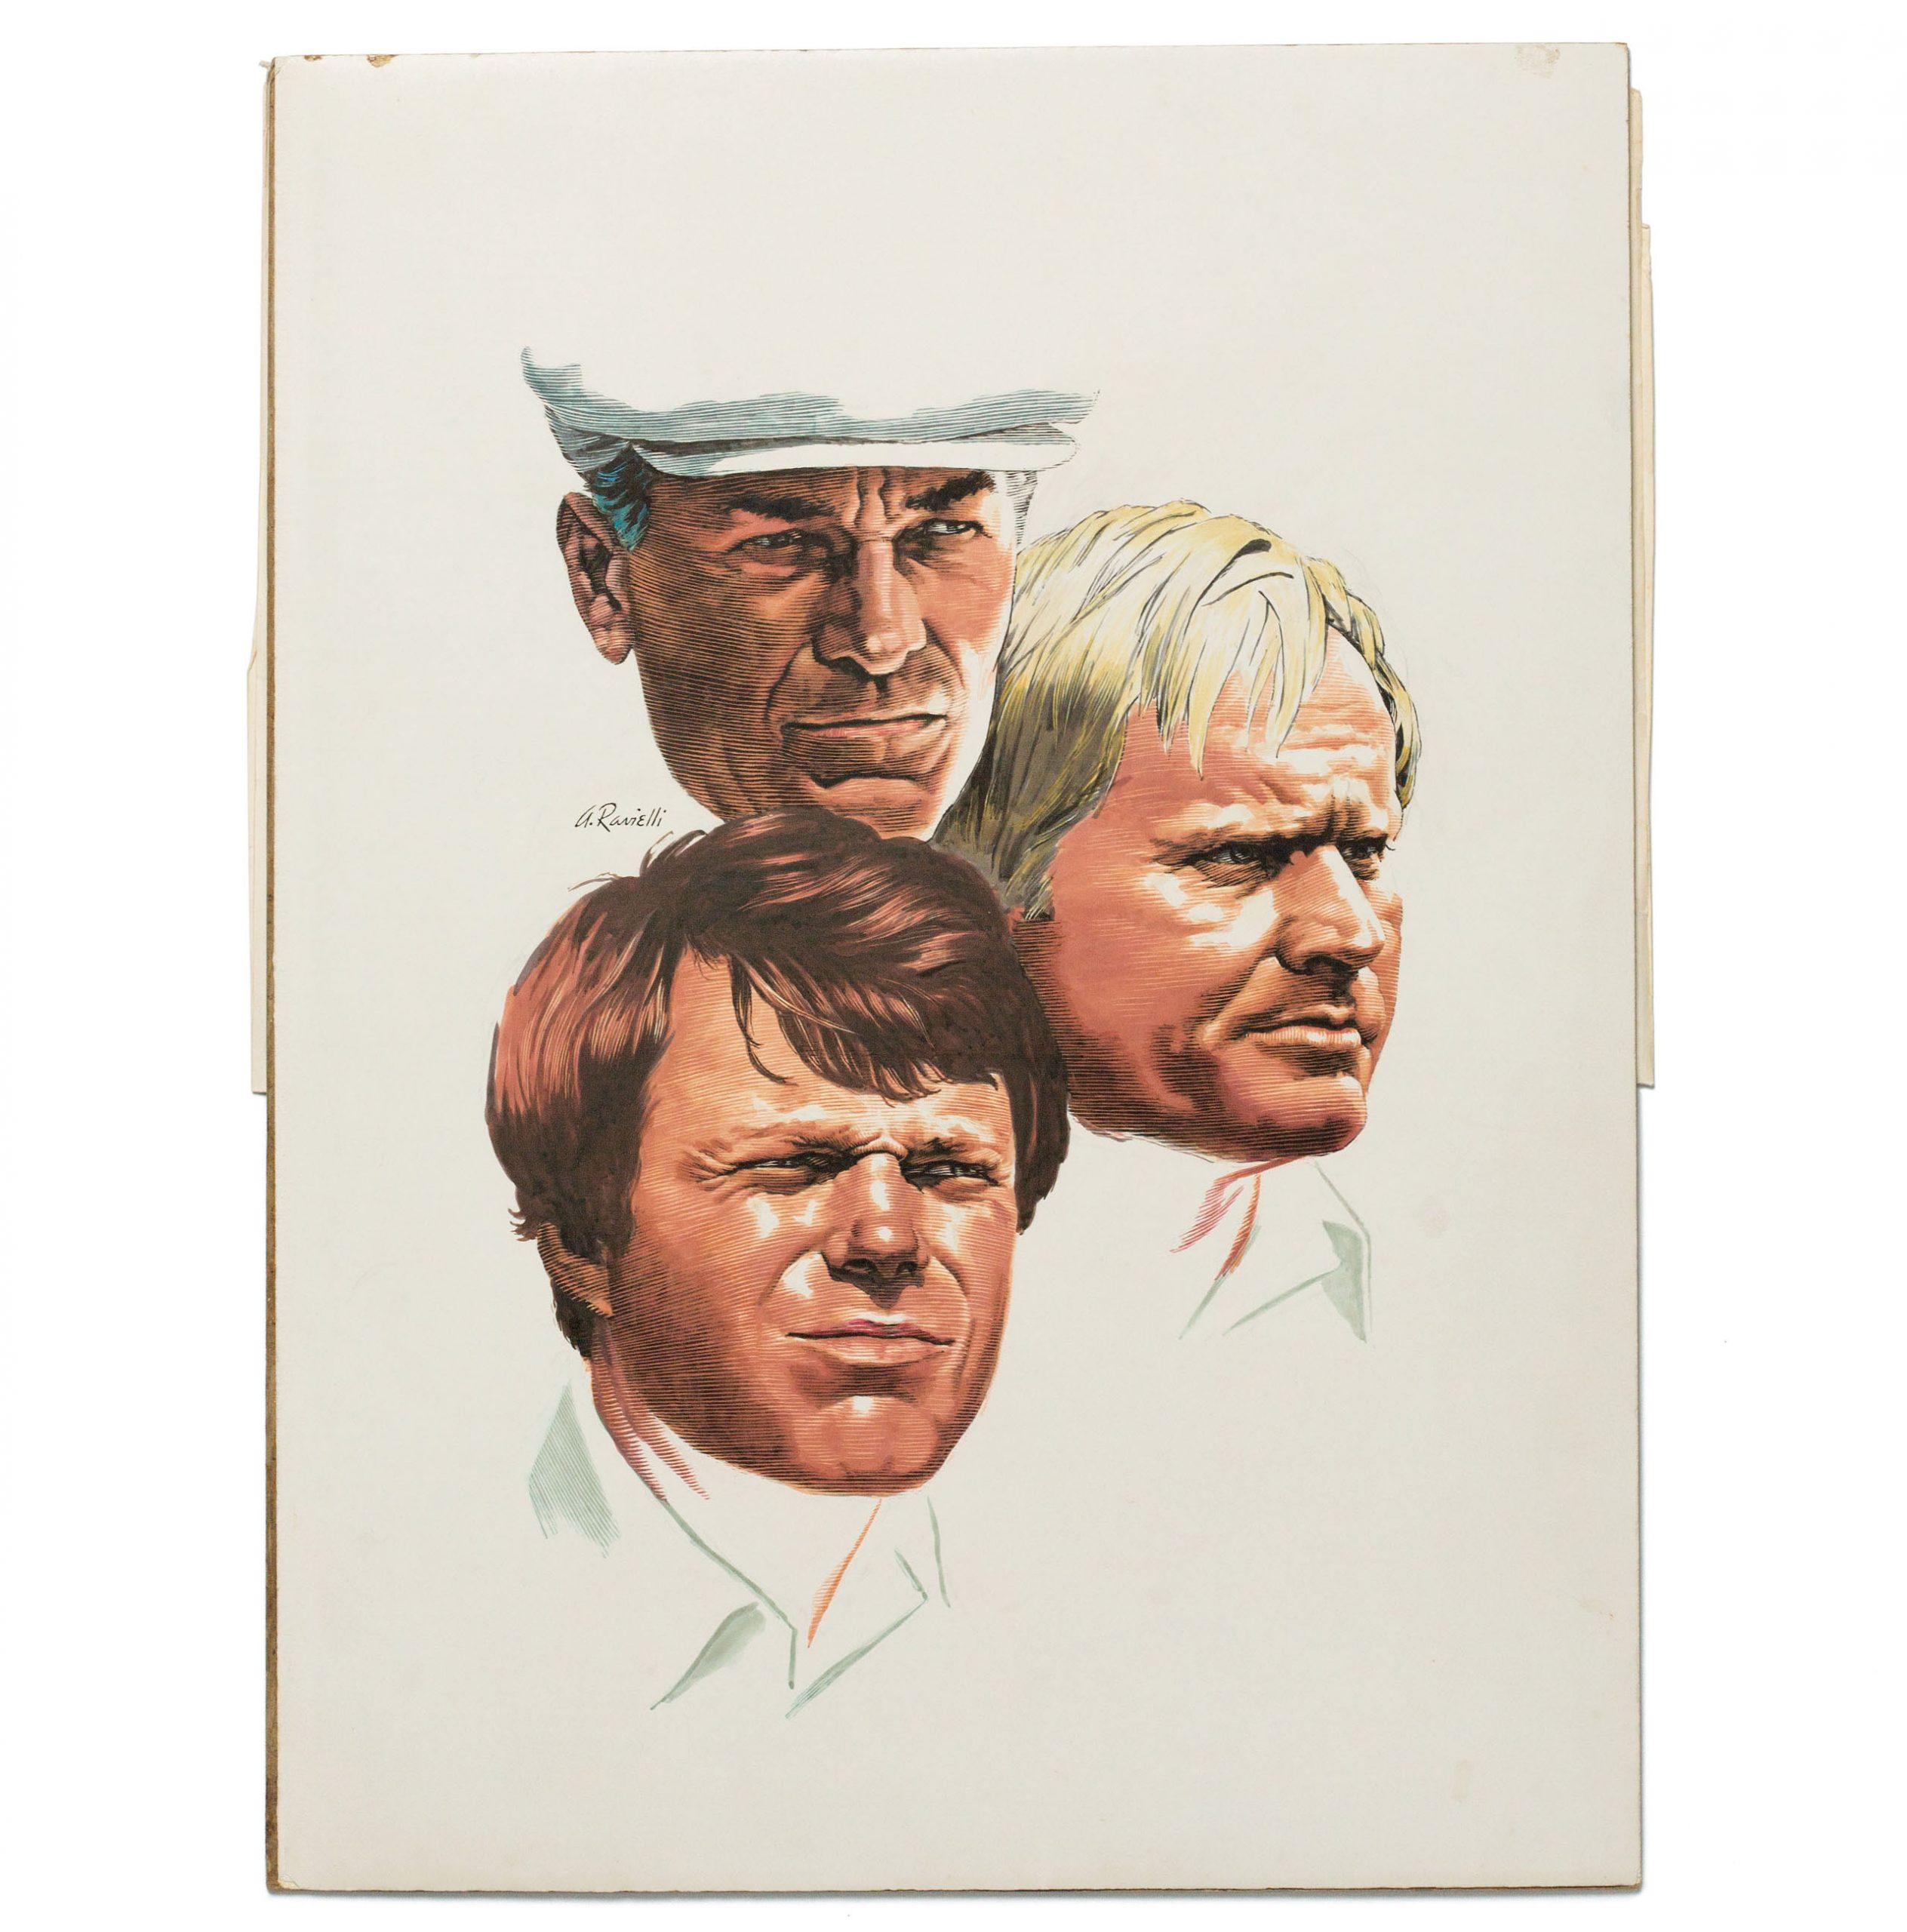 Illustration of Ben Hogan, Jack Nicklaus, and Tom Watson